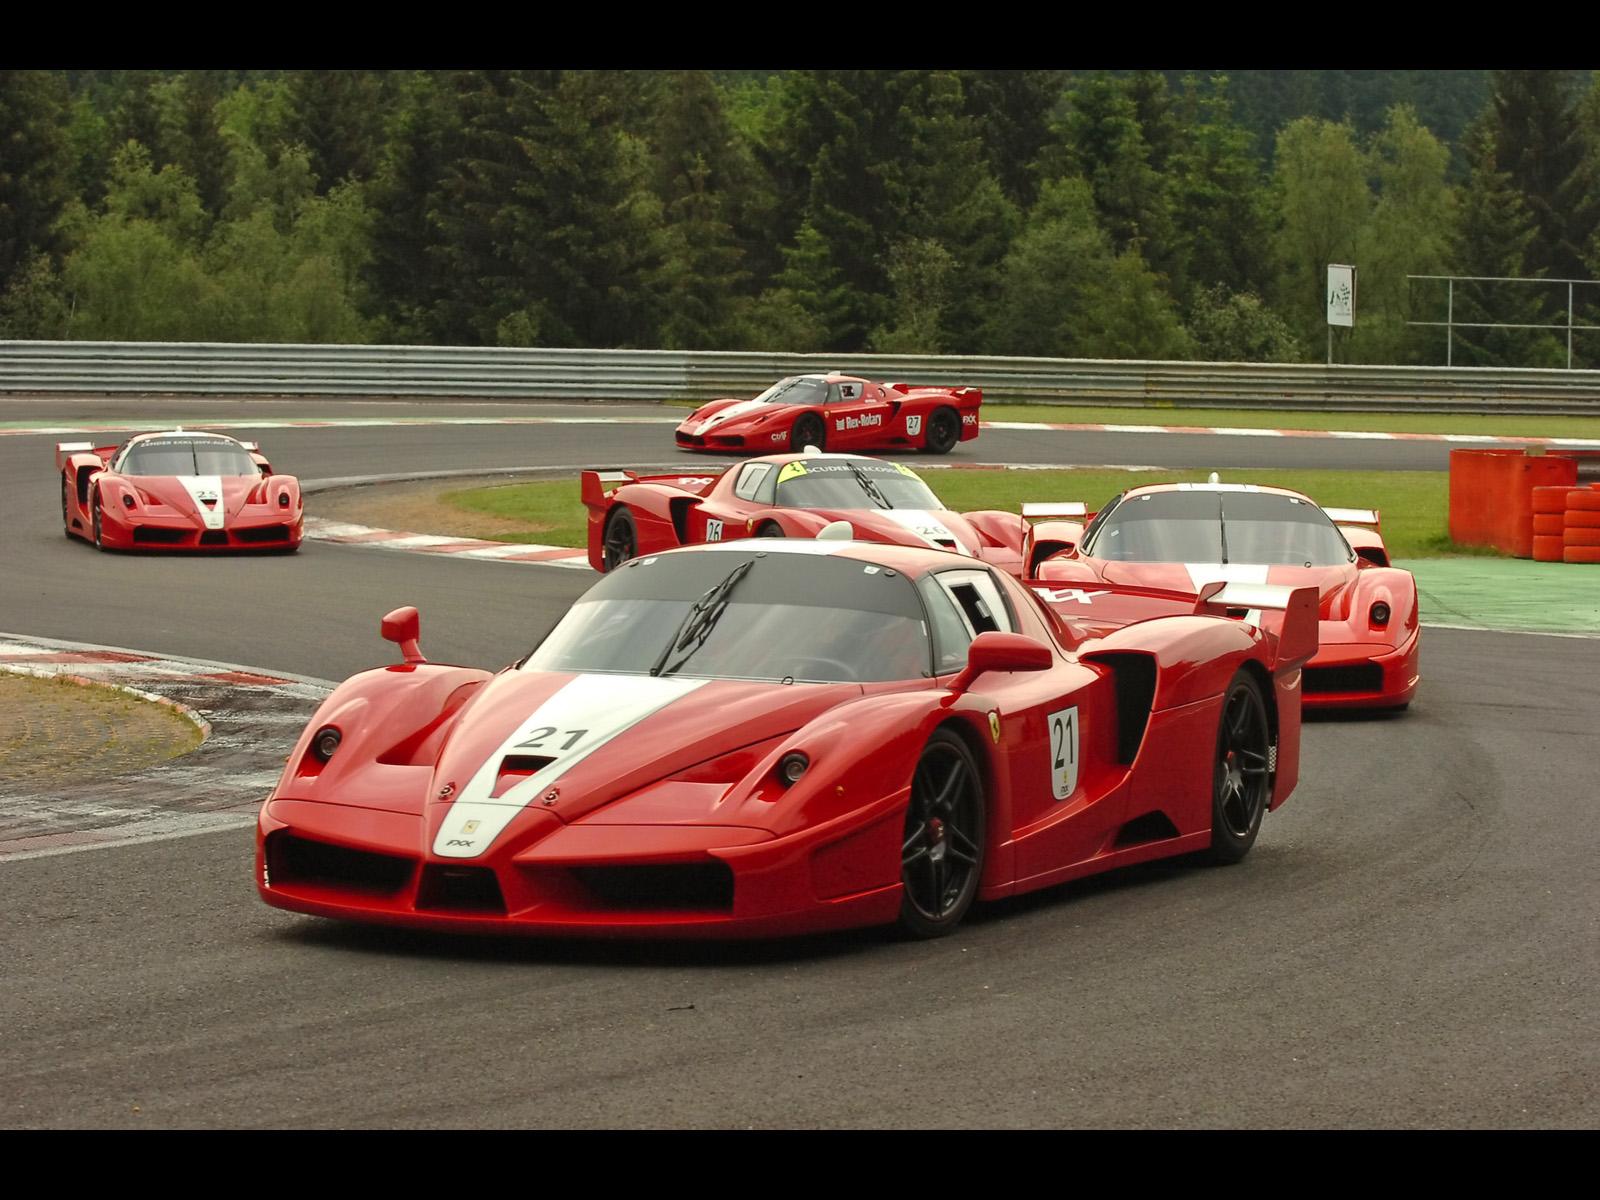 Hd Car Wallpapers Ferrari Fxx Wallpaper